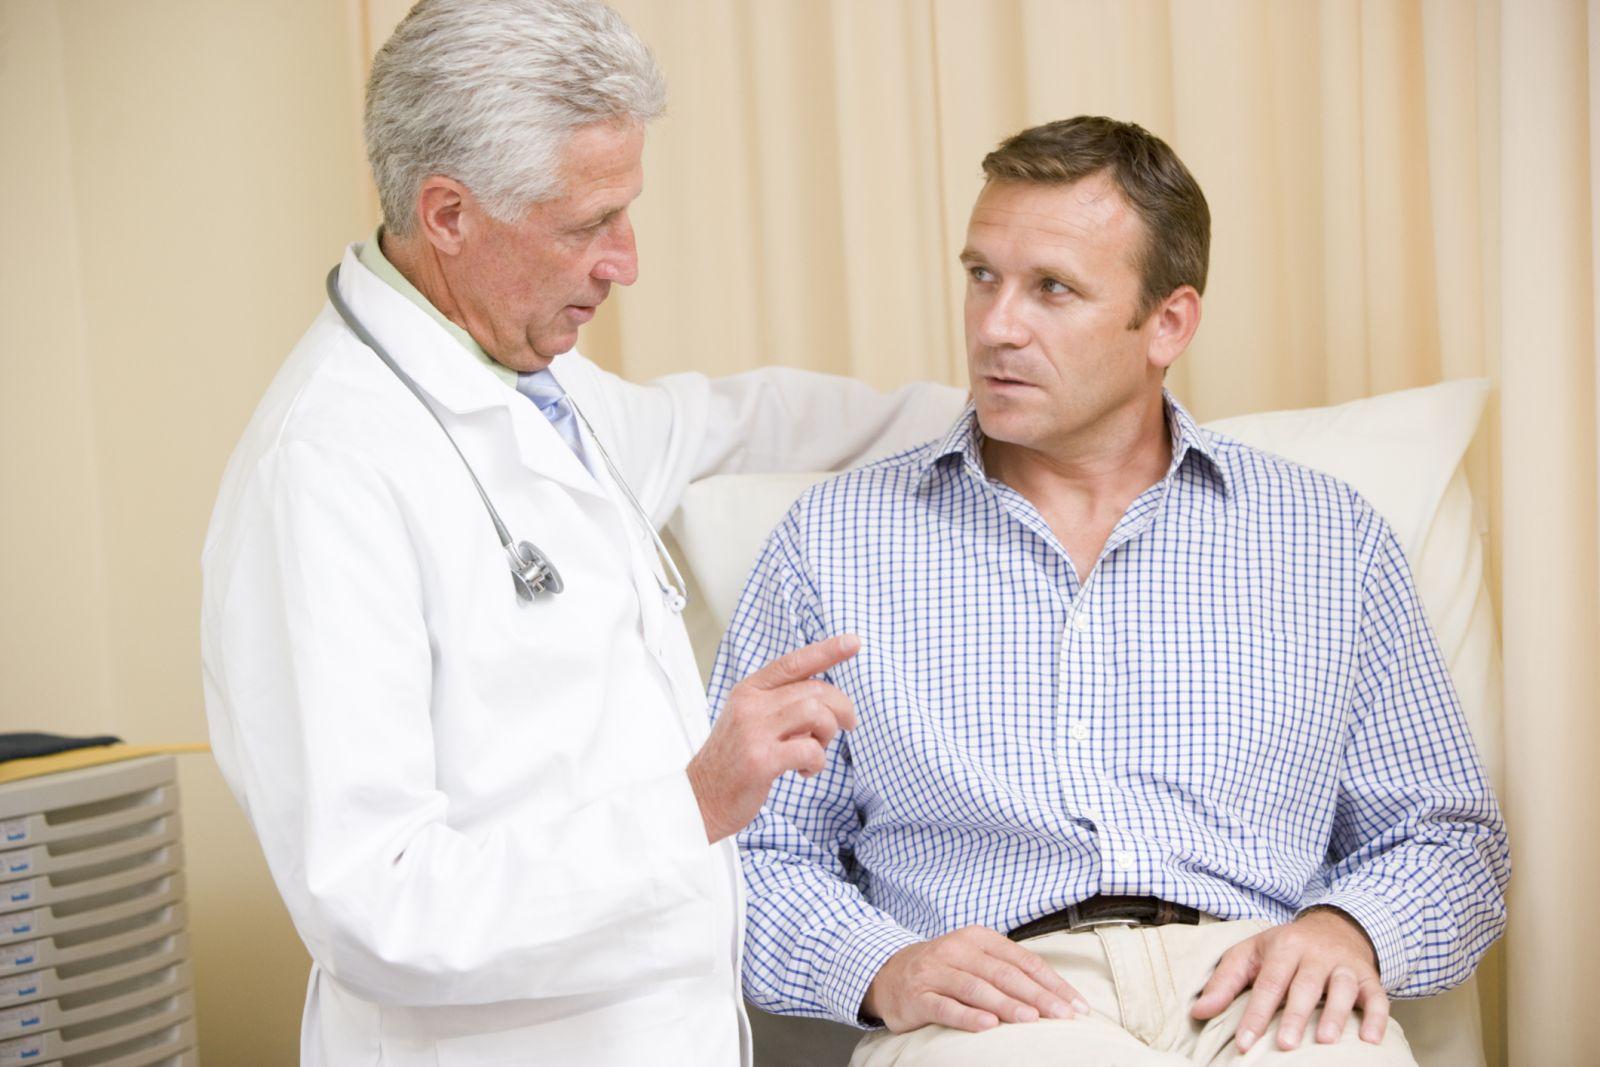 симптомы сифилиса на приеме у венеролога